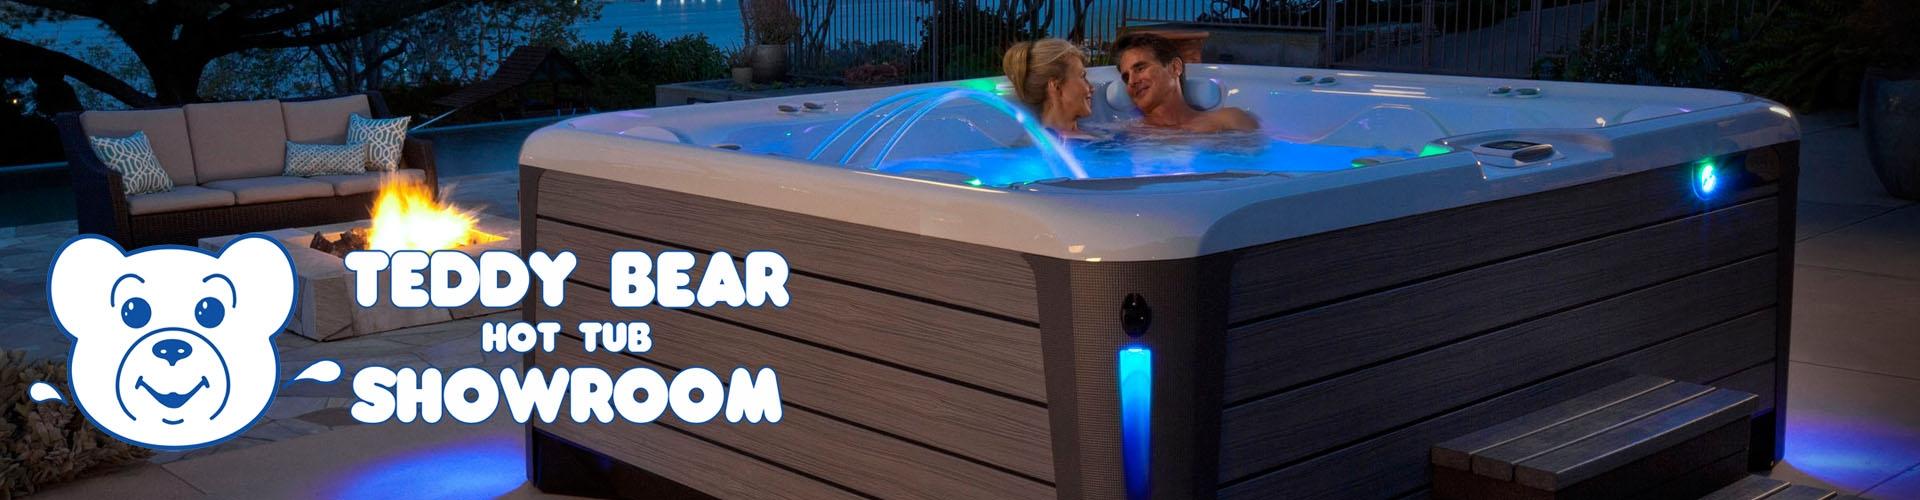 Hot Tub Showroom - Teddy Bear Pools and Spas